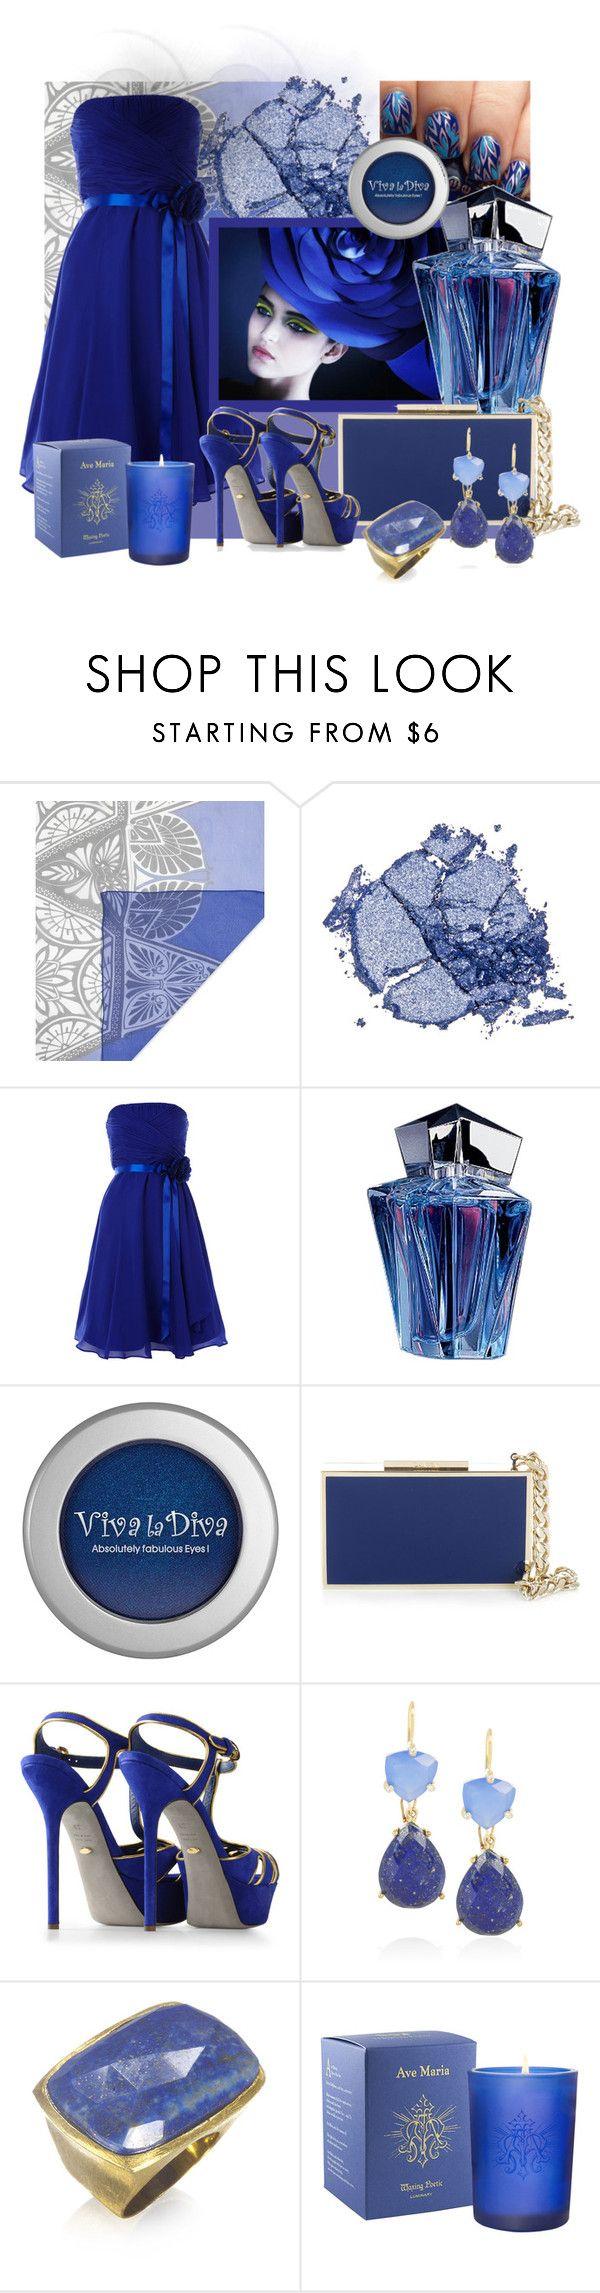 """Dark Blue Fantasy"" by pixidreams ❤ liked on Polyvore featuring Jonathan Saunders, Stila, Thierry Mugler, Viva La Diva, Lanvin, Sergio Rossi, Isharya, Wendy Mink, Waxing Poetic and drop earrings"